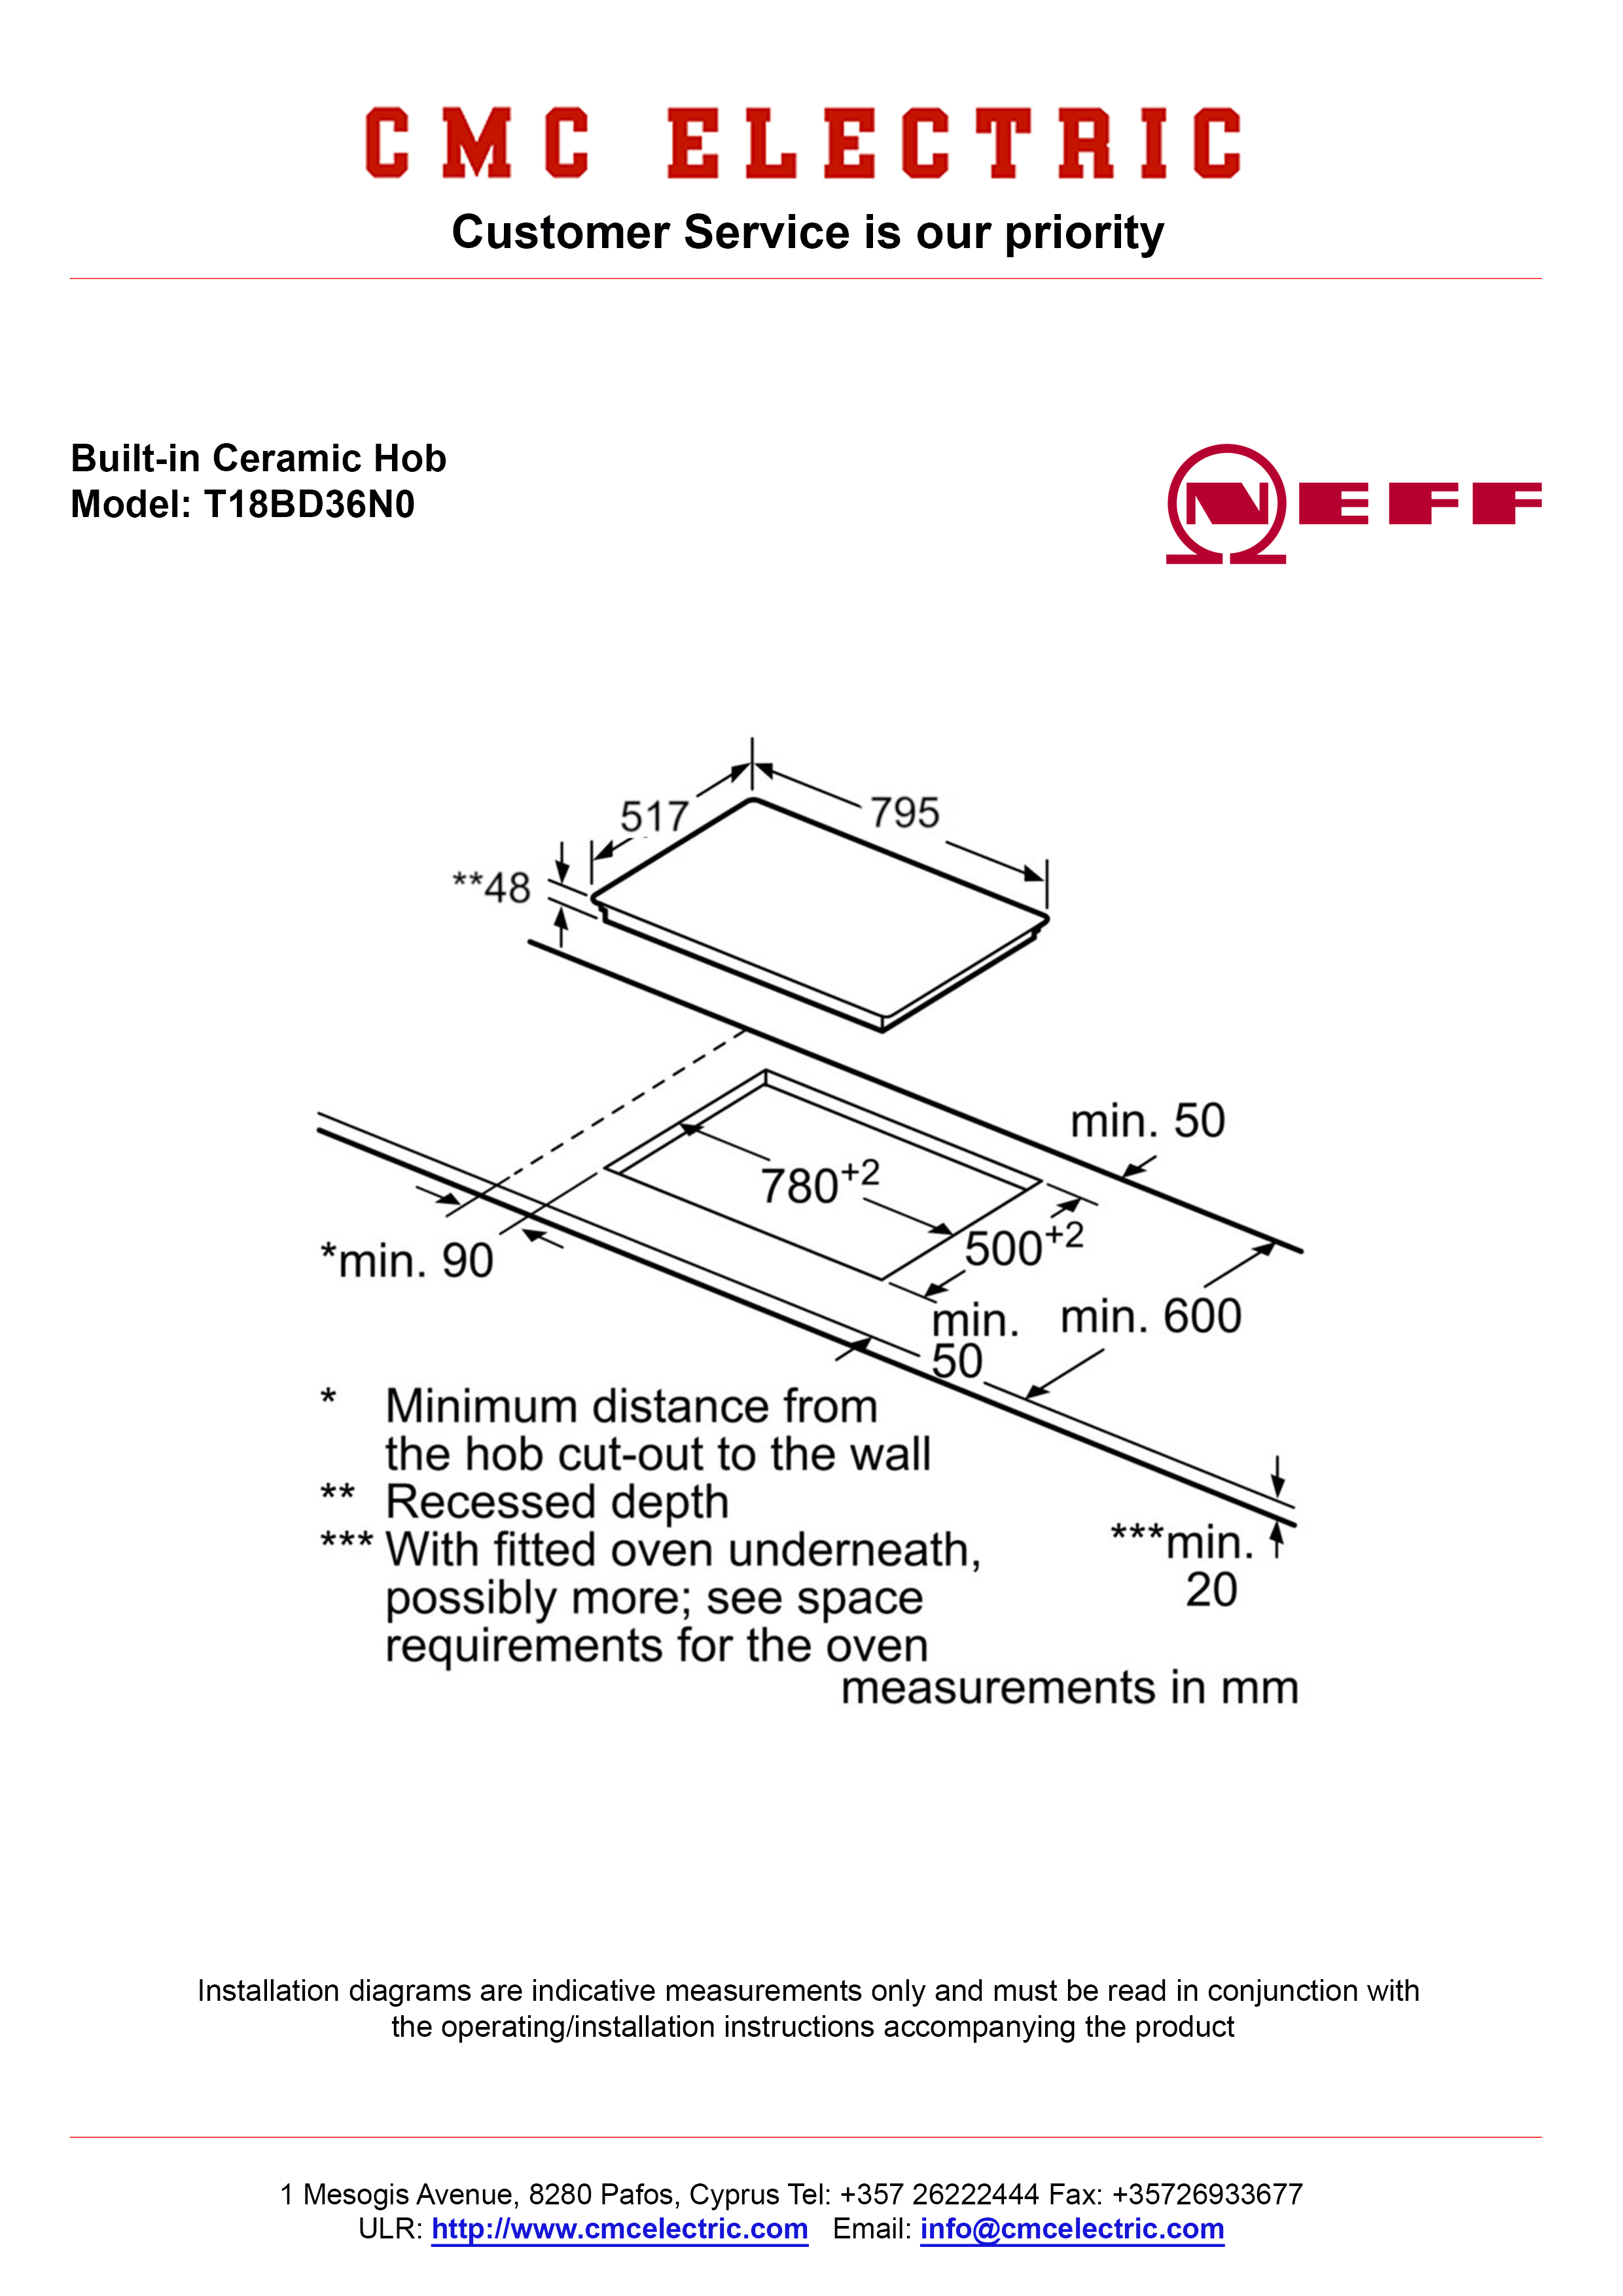 Neff T18bd36n0 Built In Ceramic Hob Cmc Electric Buy Electrical Tilt Trim Wiring Diagram Diagramme